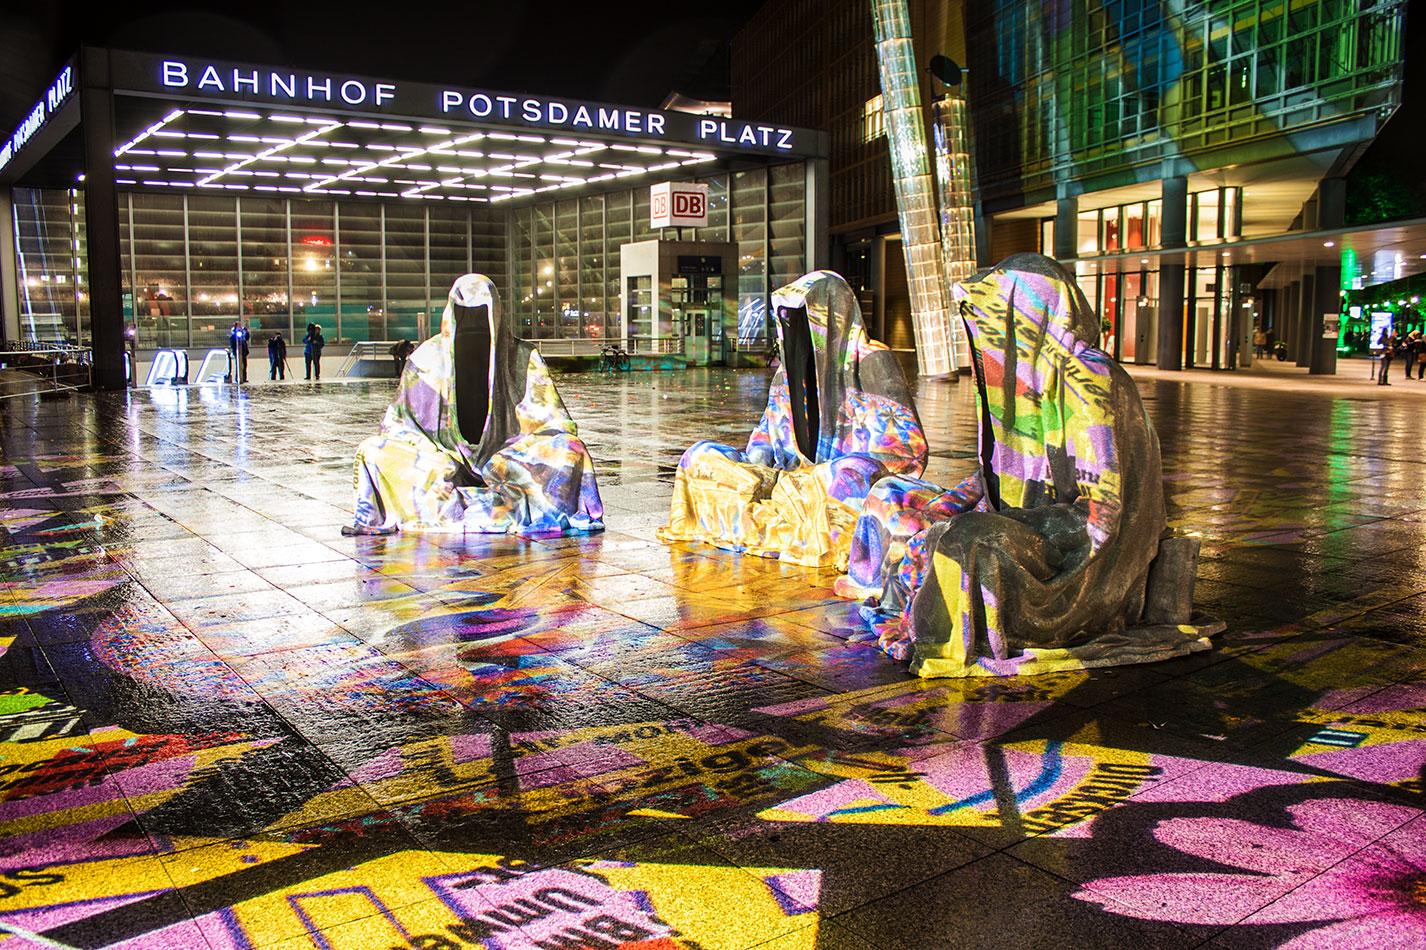 festival-of-lights-berlin-light-art-festival-contemporary-fine-art-design-show-large-scale-sculpture-guardiansof-time-manfred-kili-kielnhofer-large-scale-monumental-sculpture-3856